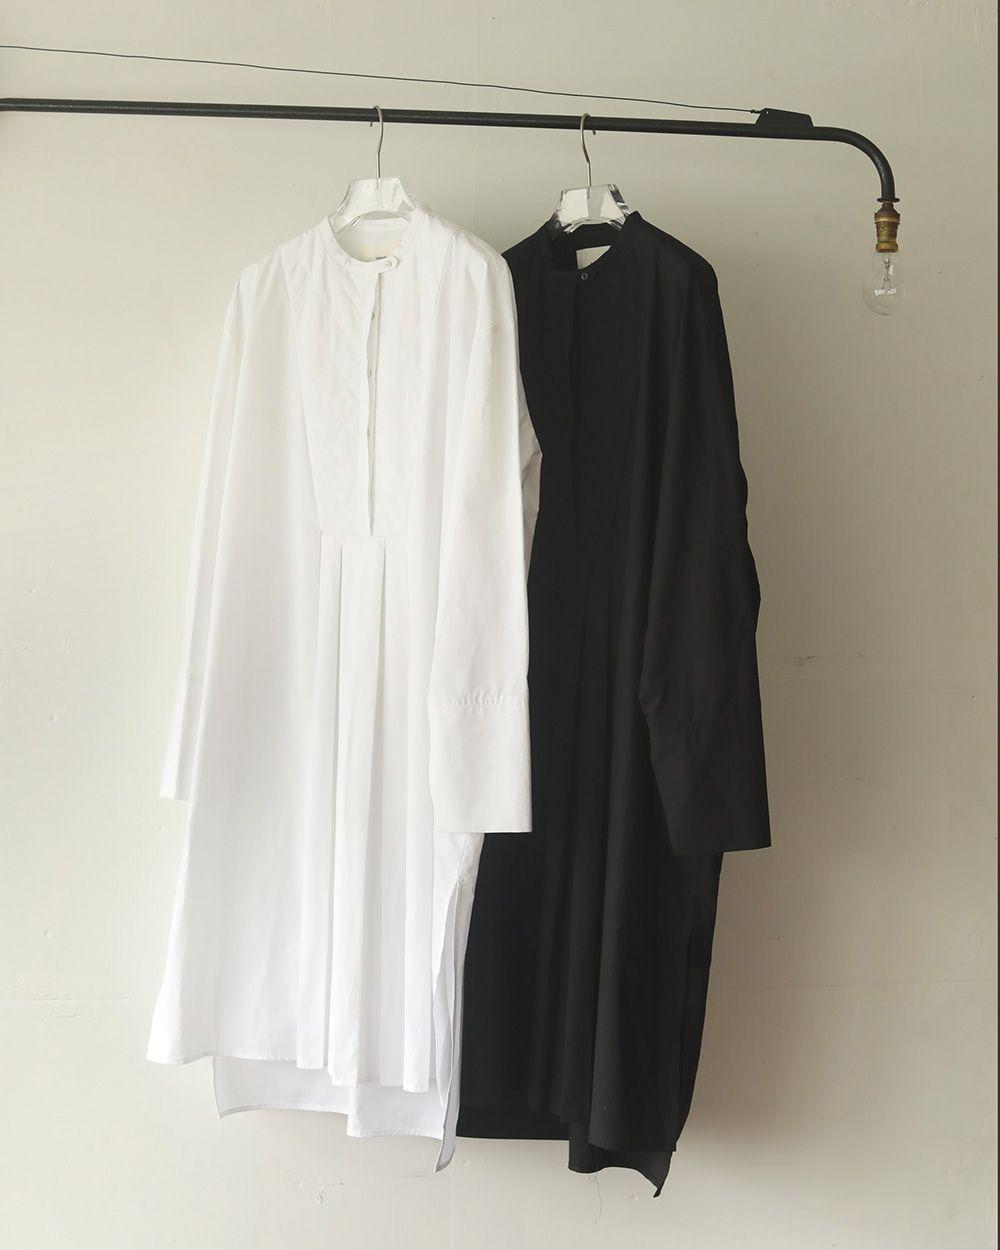 Quilting Shirts Dress